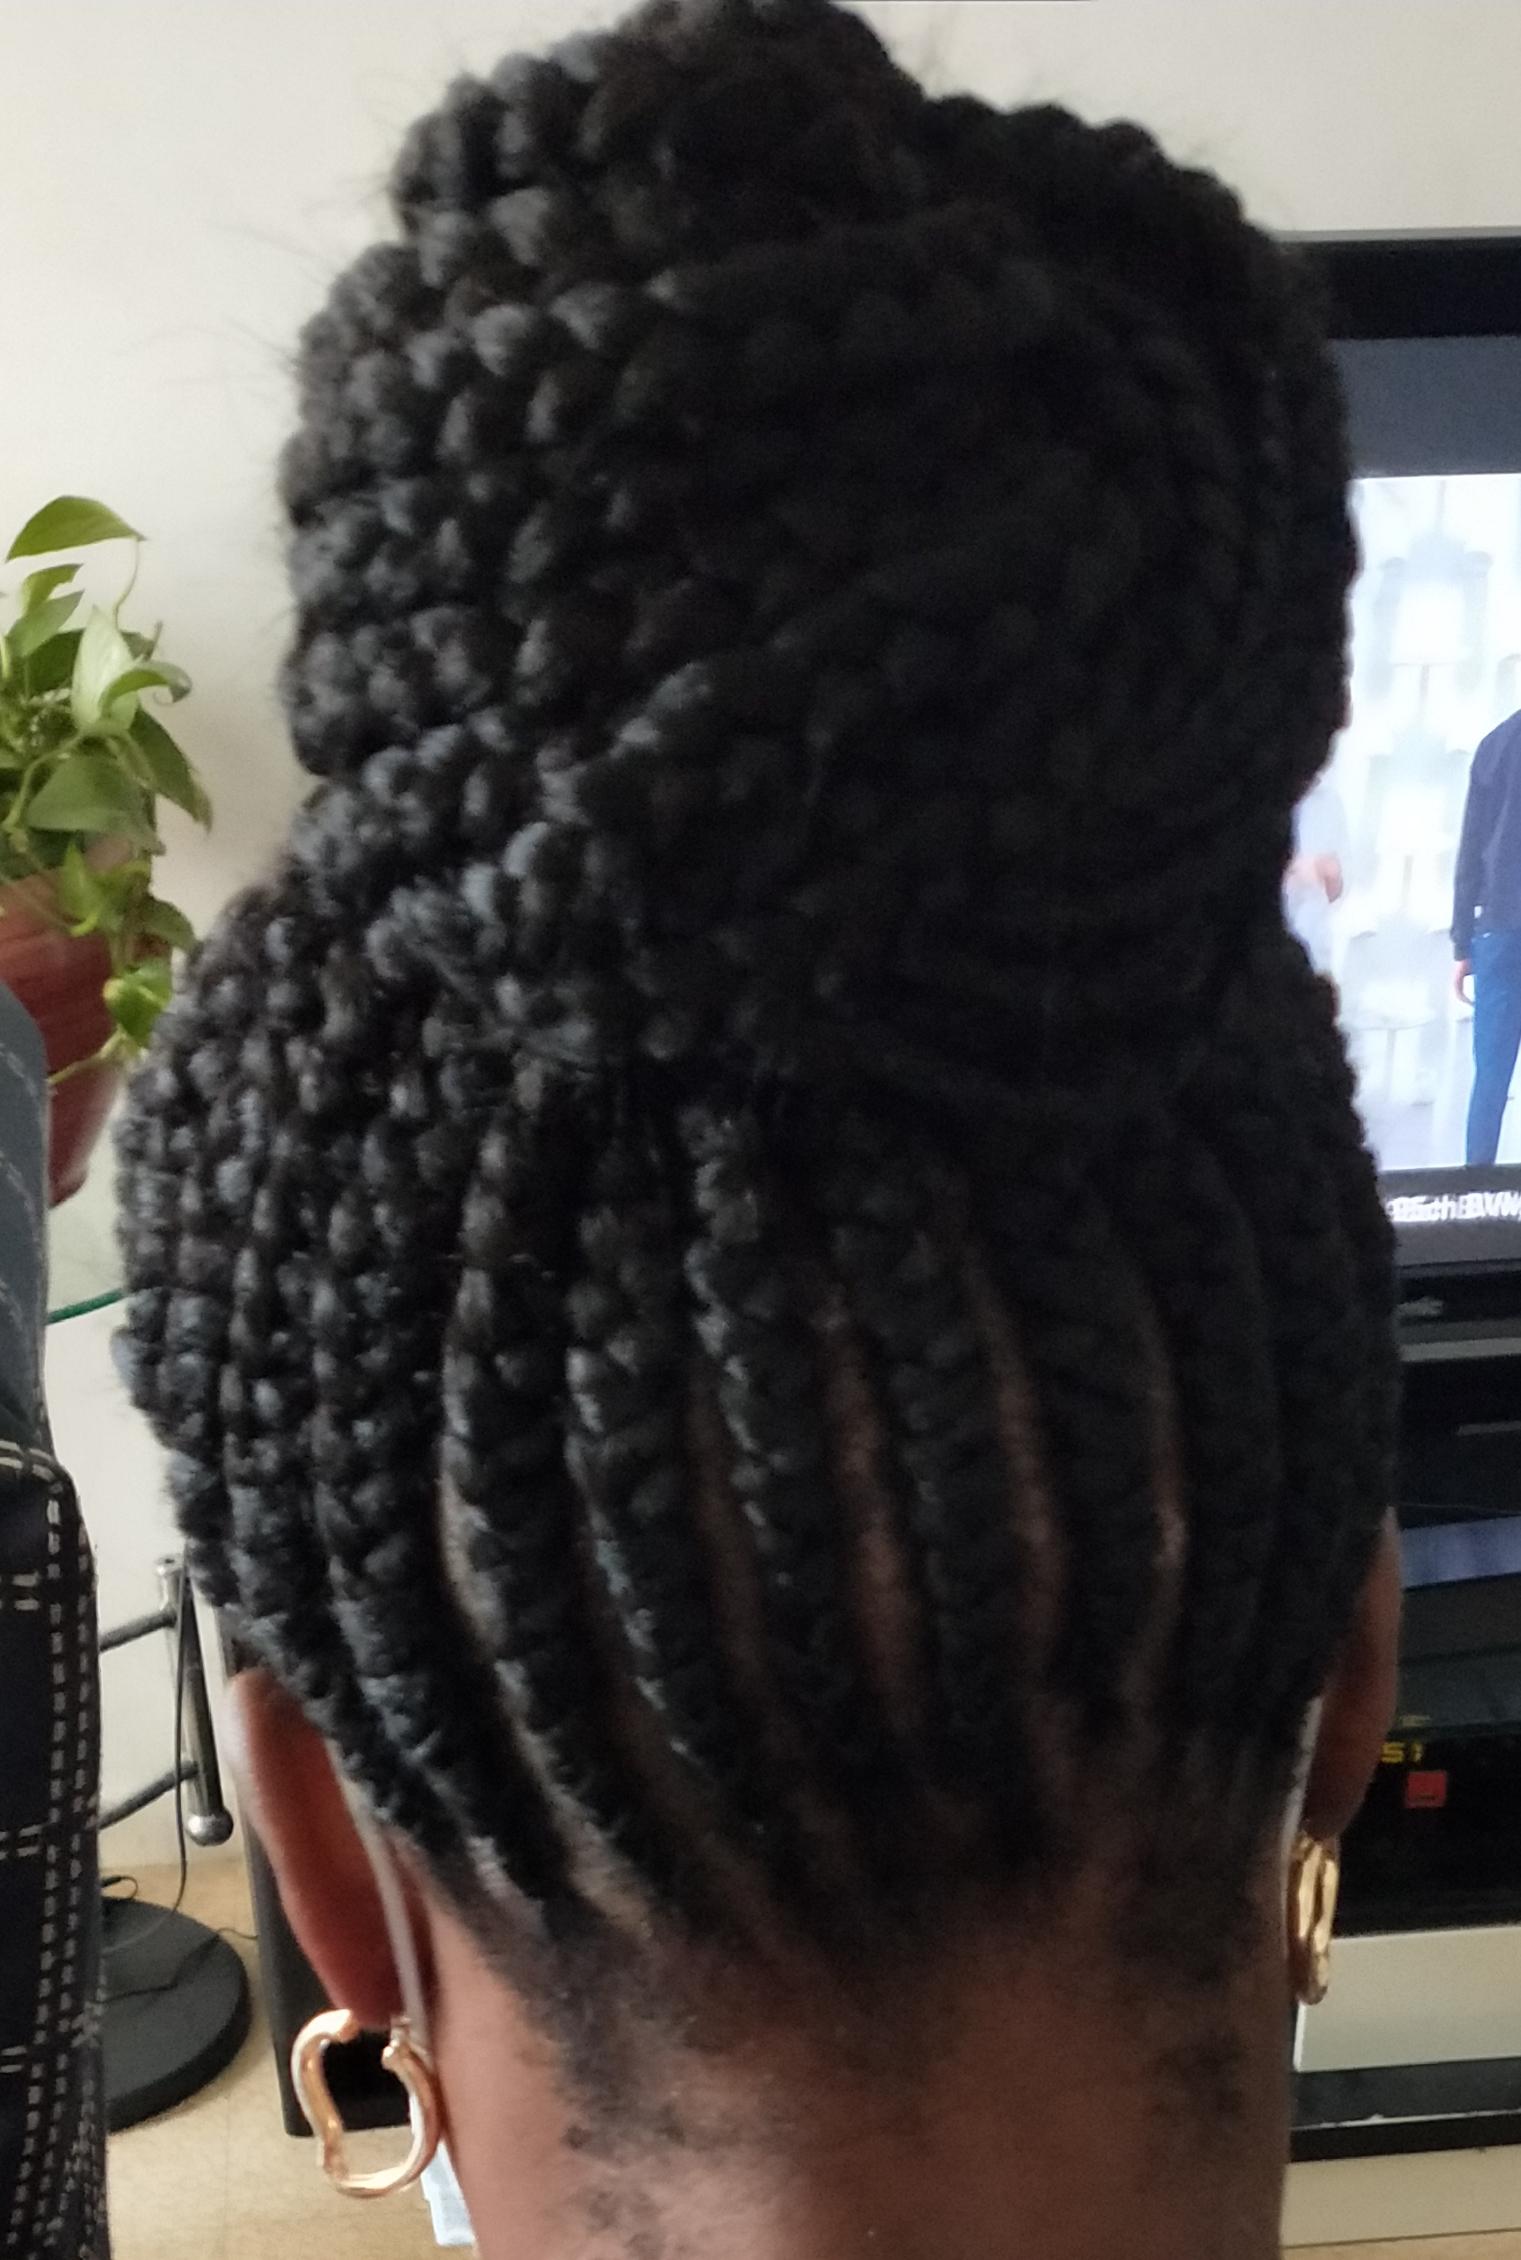 salon de coiffure afro tresse tresses box braids crochet braids vanilles tissages paris 75 77 78 91 92 93 94 95 AYUFCKKU